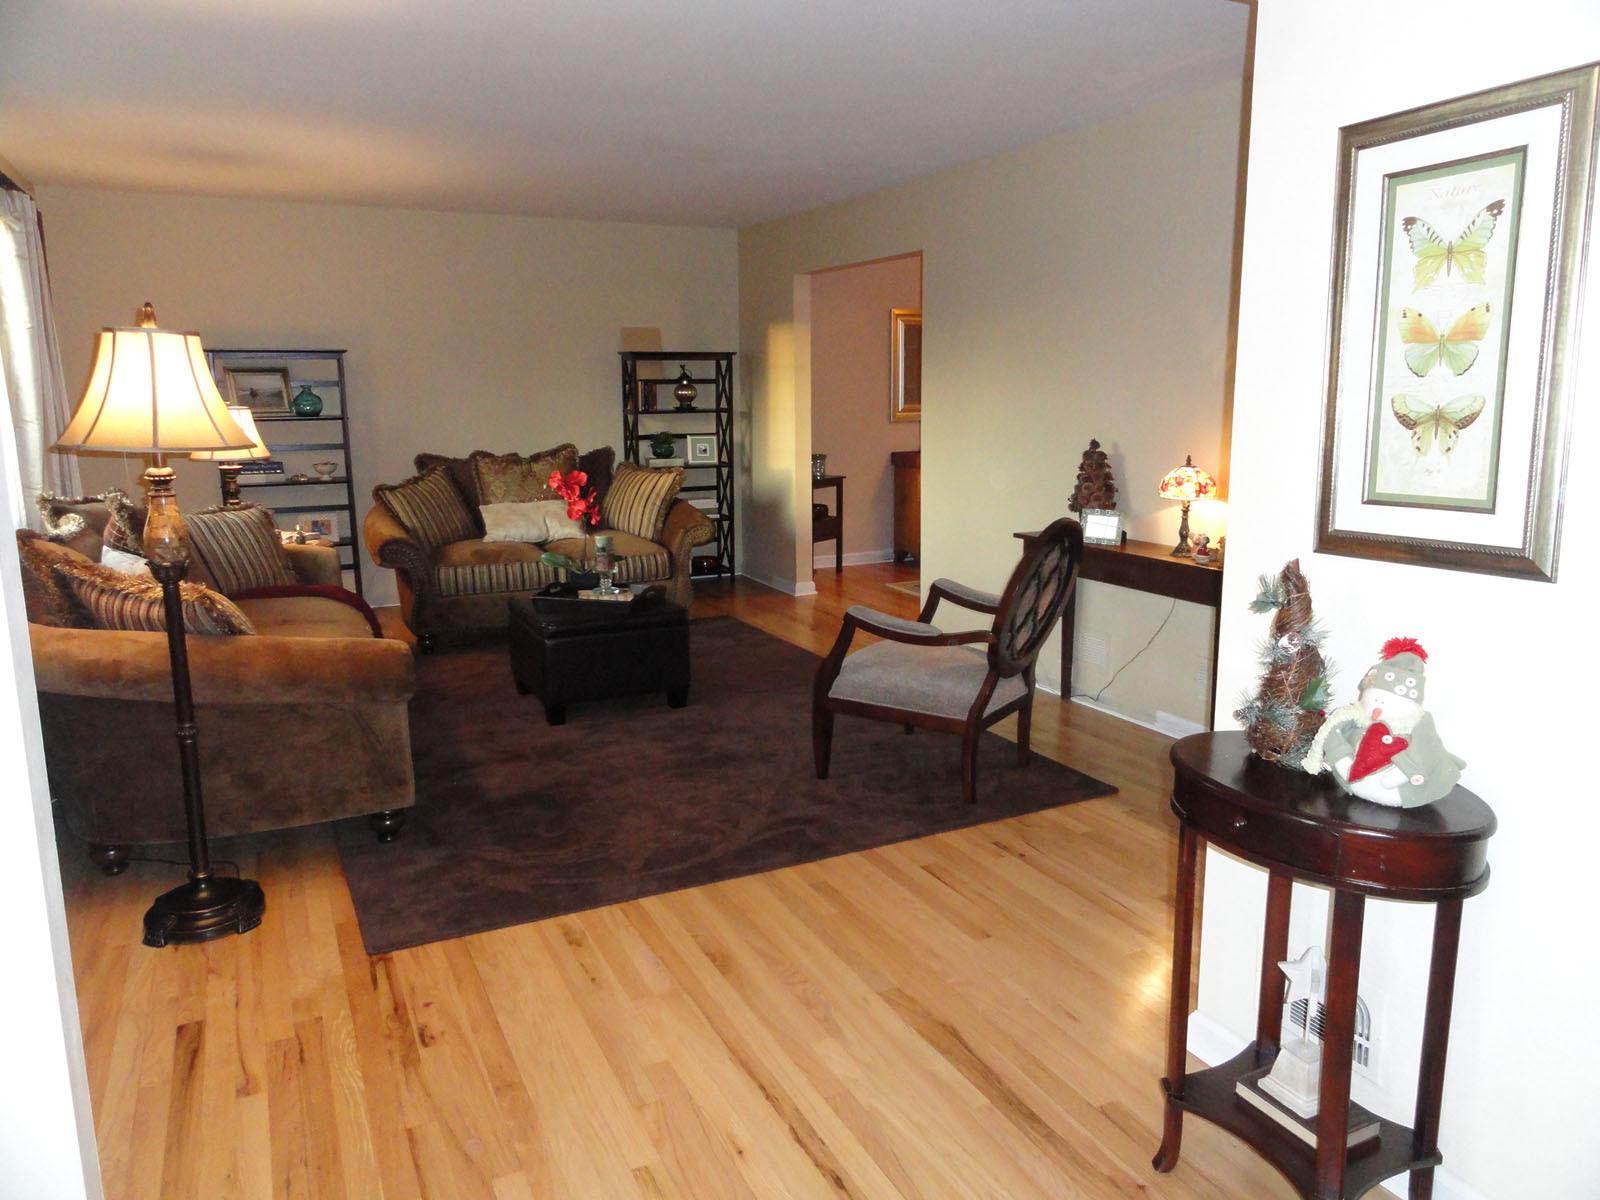 Bland Living Room - help? Ideas? (floor, paint, ceiling